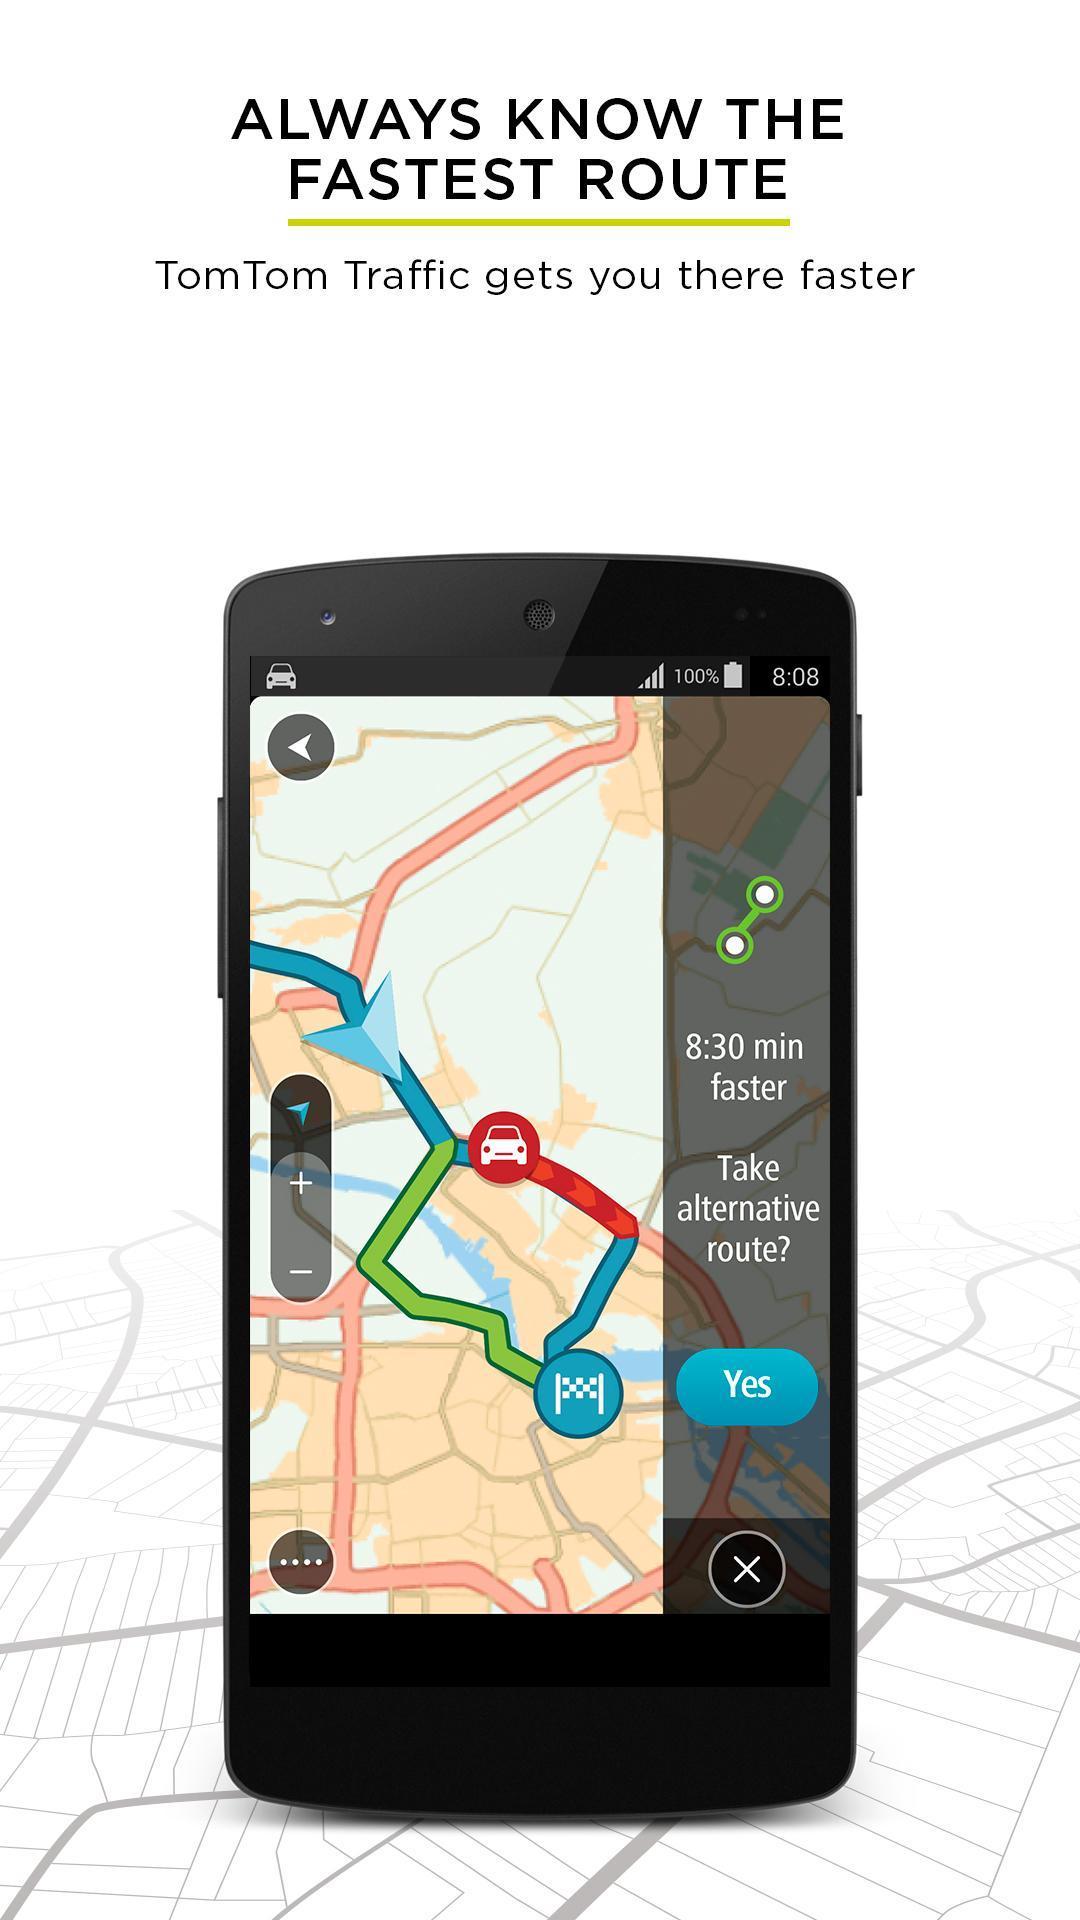 TomTom GPS Navigation - Live Traffic Alerts & Maps 2.0.4 Screenshot 1